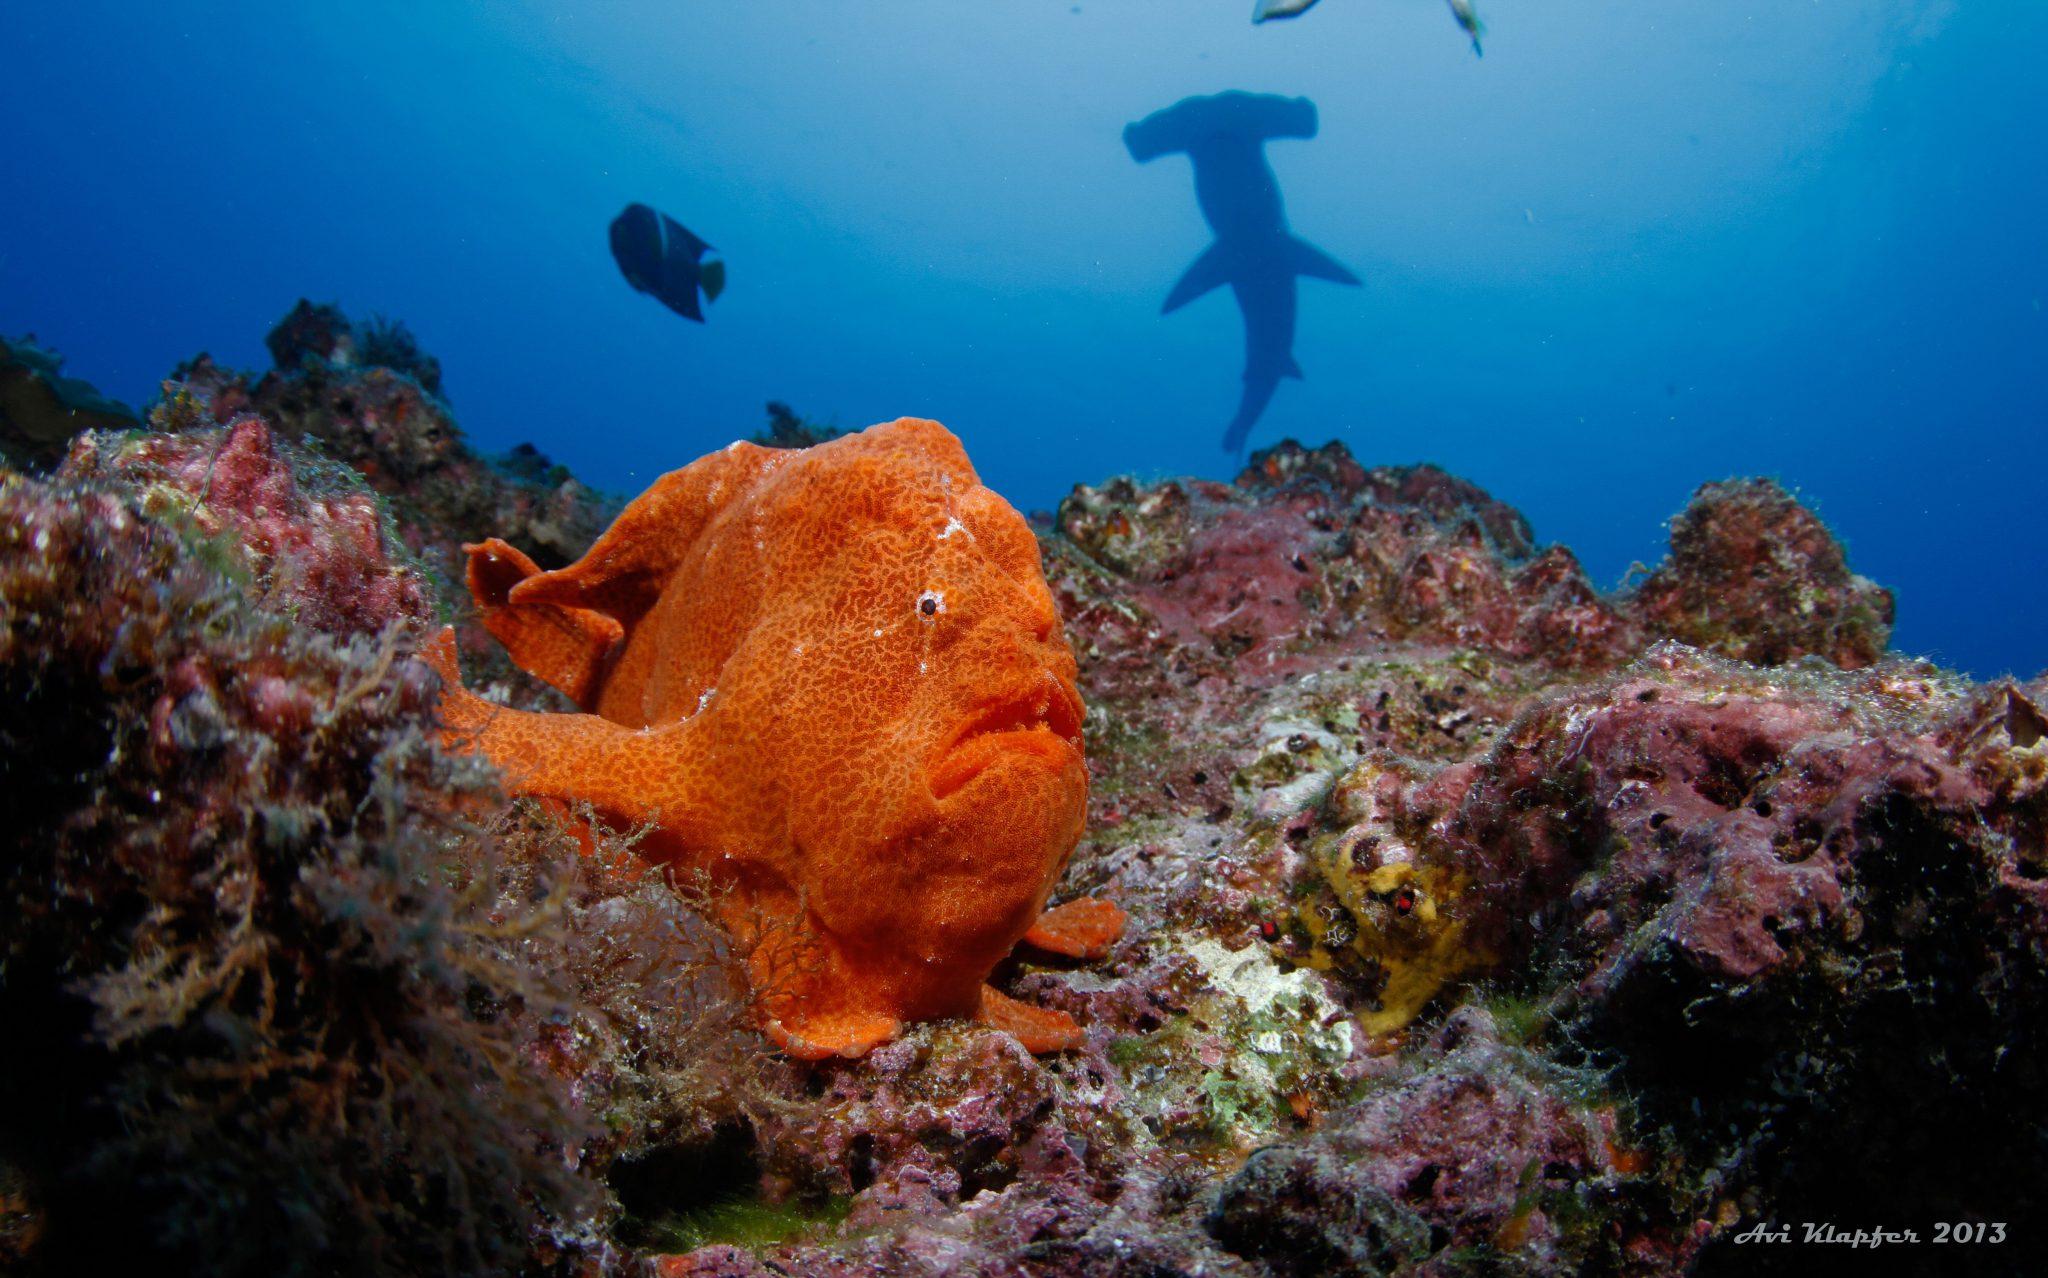 Undersea Hunter Group 2156 - Underseahunter Group